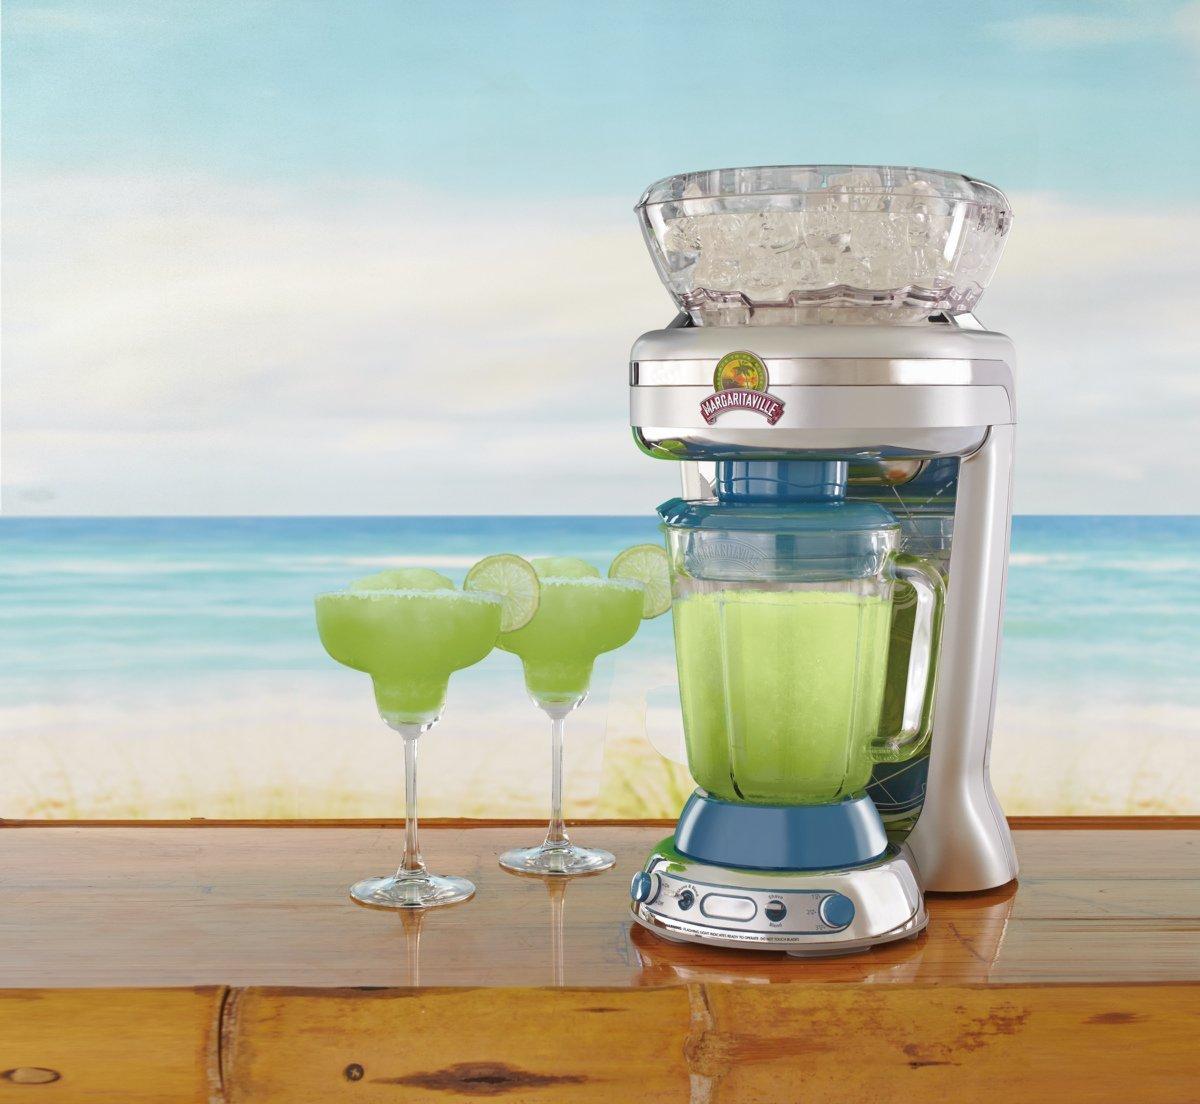 Margaritaville Key West Frozen Concoction Maker with Easy Pour Jar and XL Ice Reservoir, DM1900 by Margaritaville (Image #7)